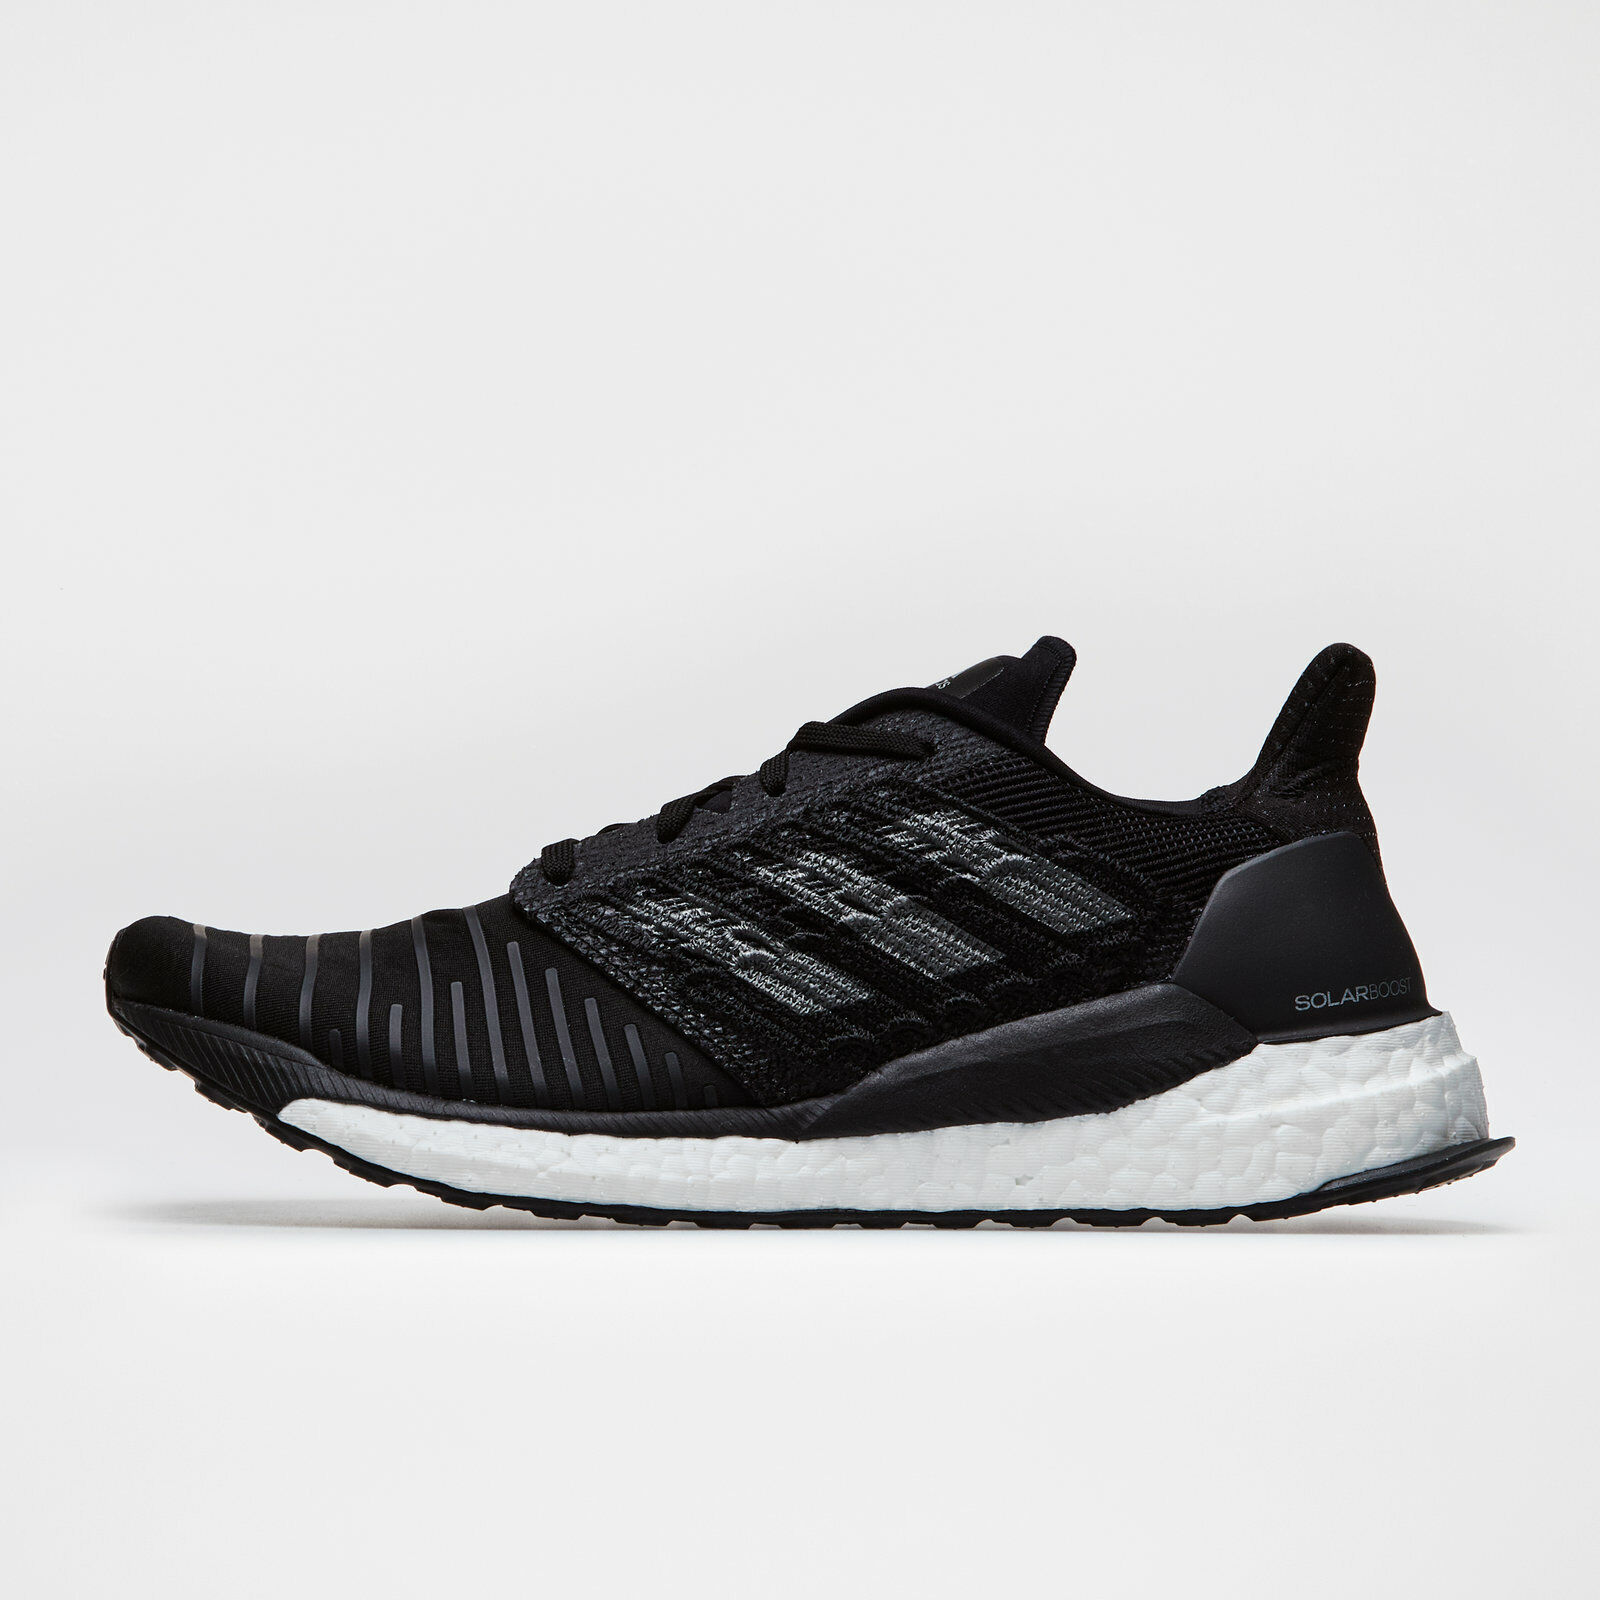 Adidas Para Hombre Boost Solar Negro Zapatillas Para Correr Deportes Entrenadores Calzado